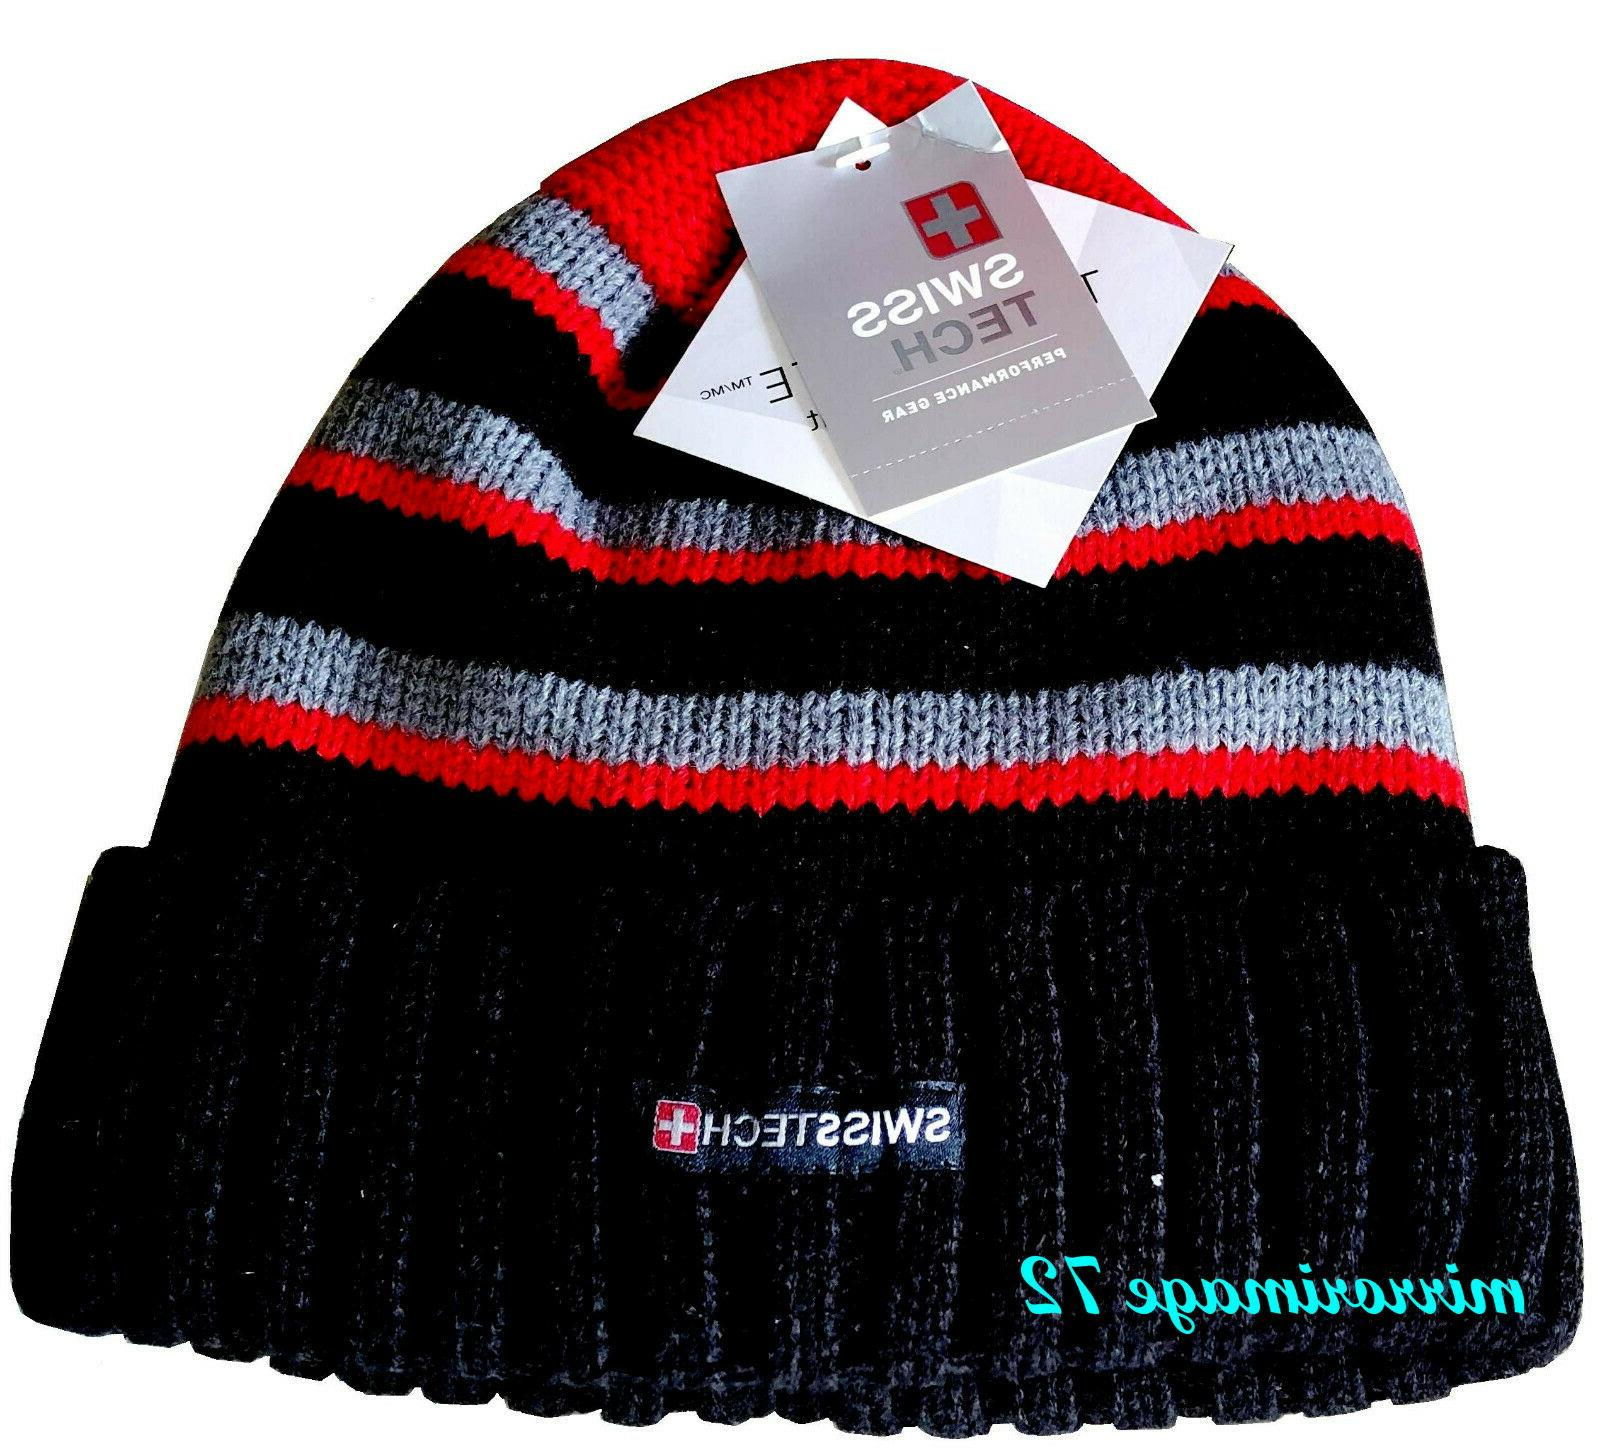 3m thinsulate boys performance gear knit winter